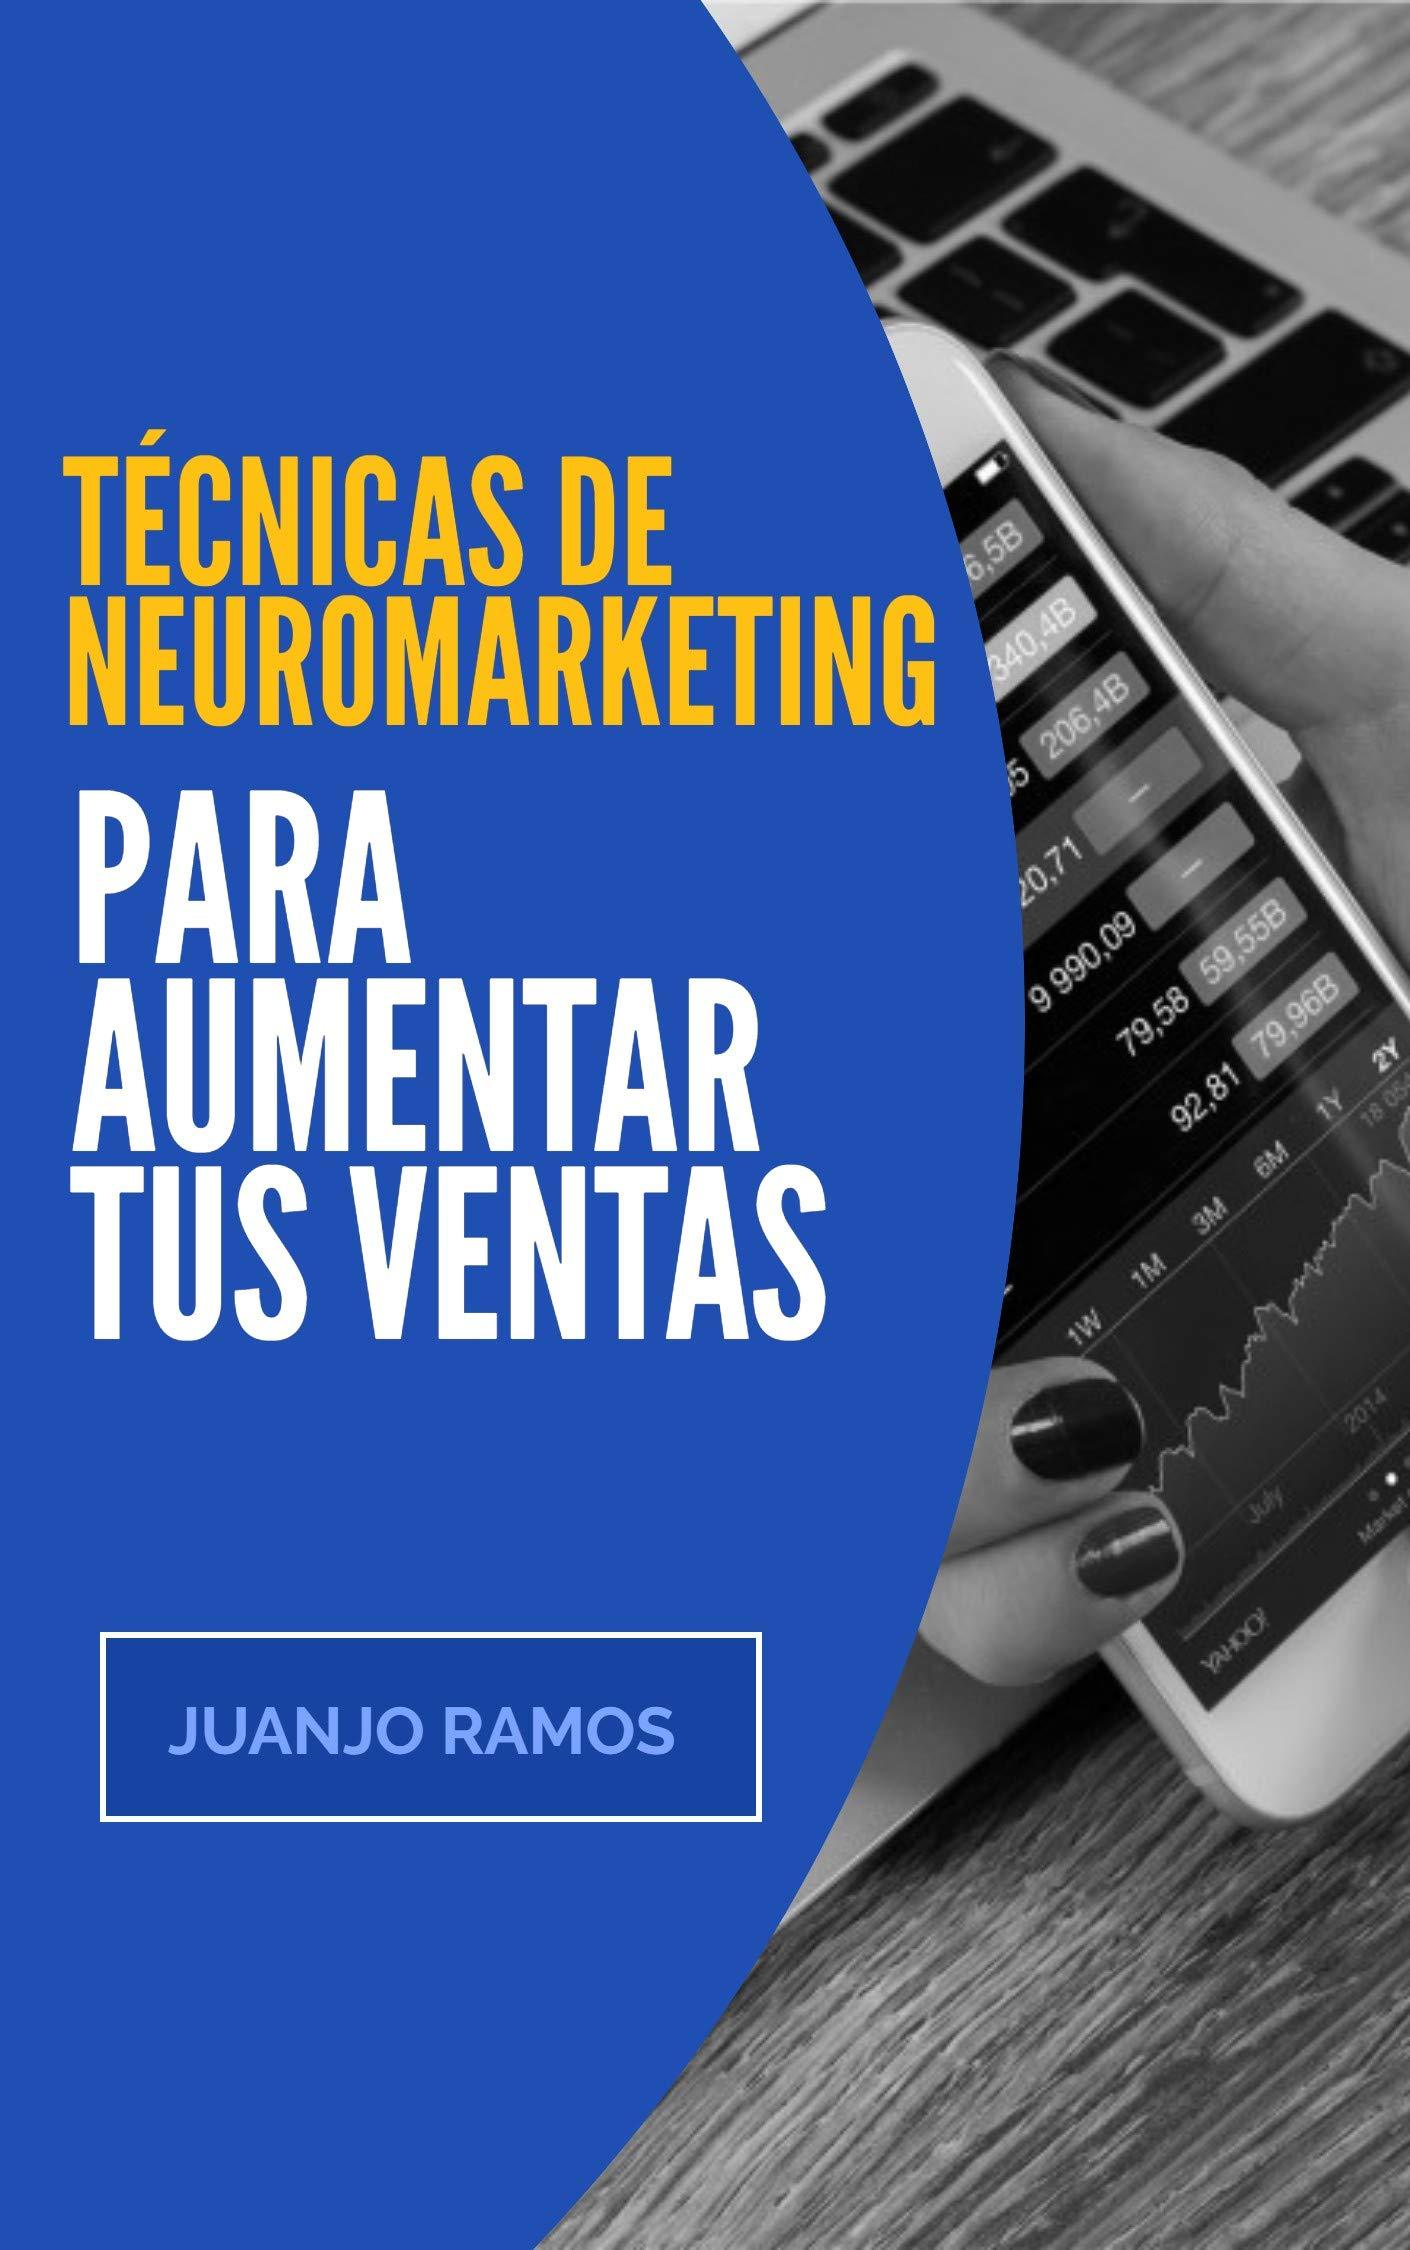 Técnicas de neuromarketing para aumentar tus ventas (Spanish Edition)